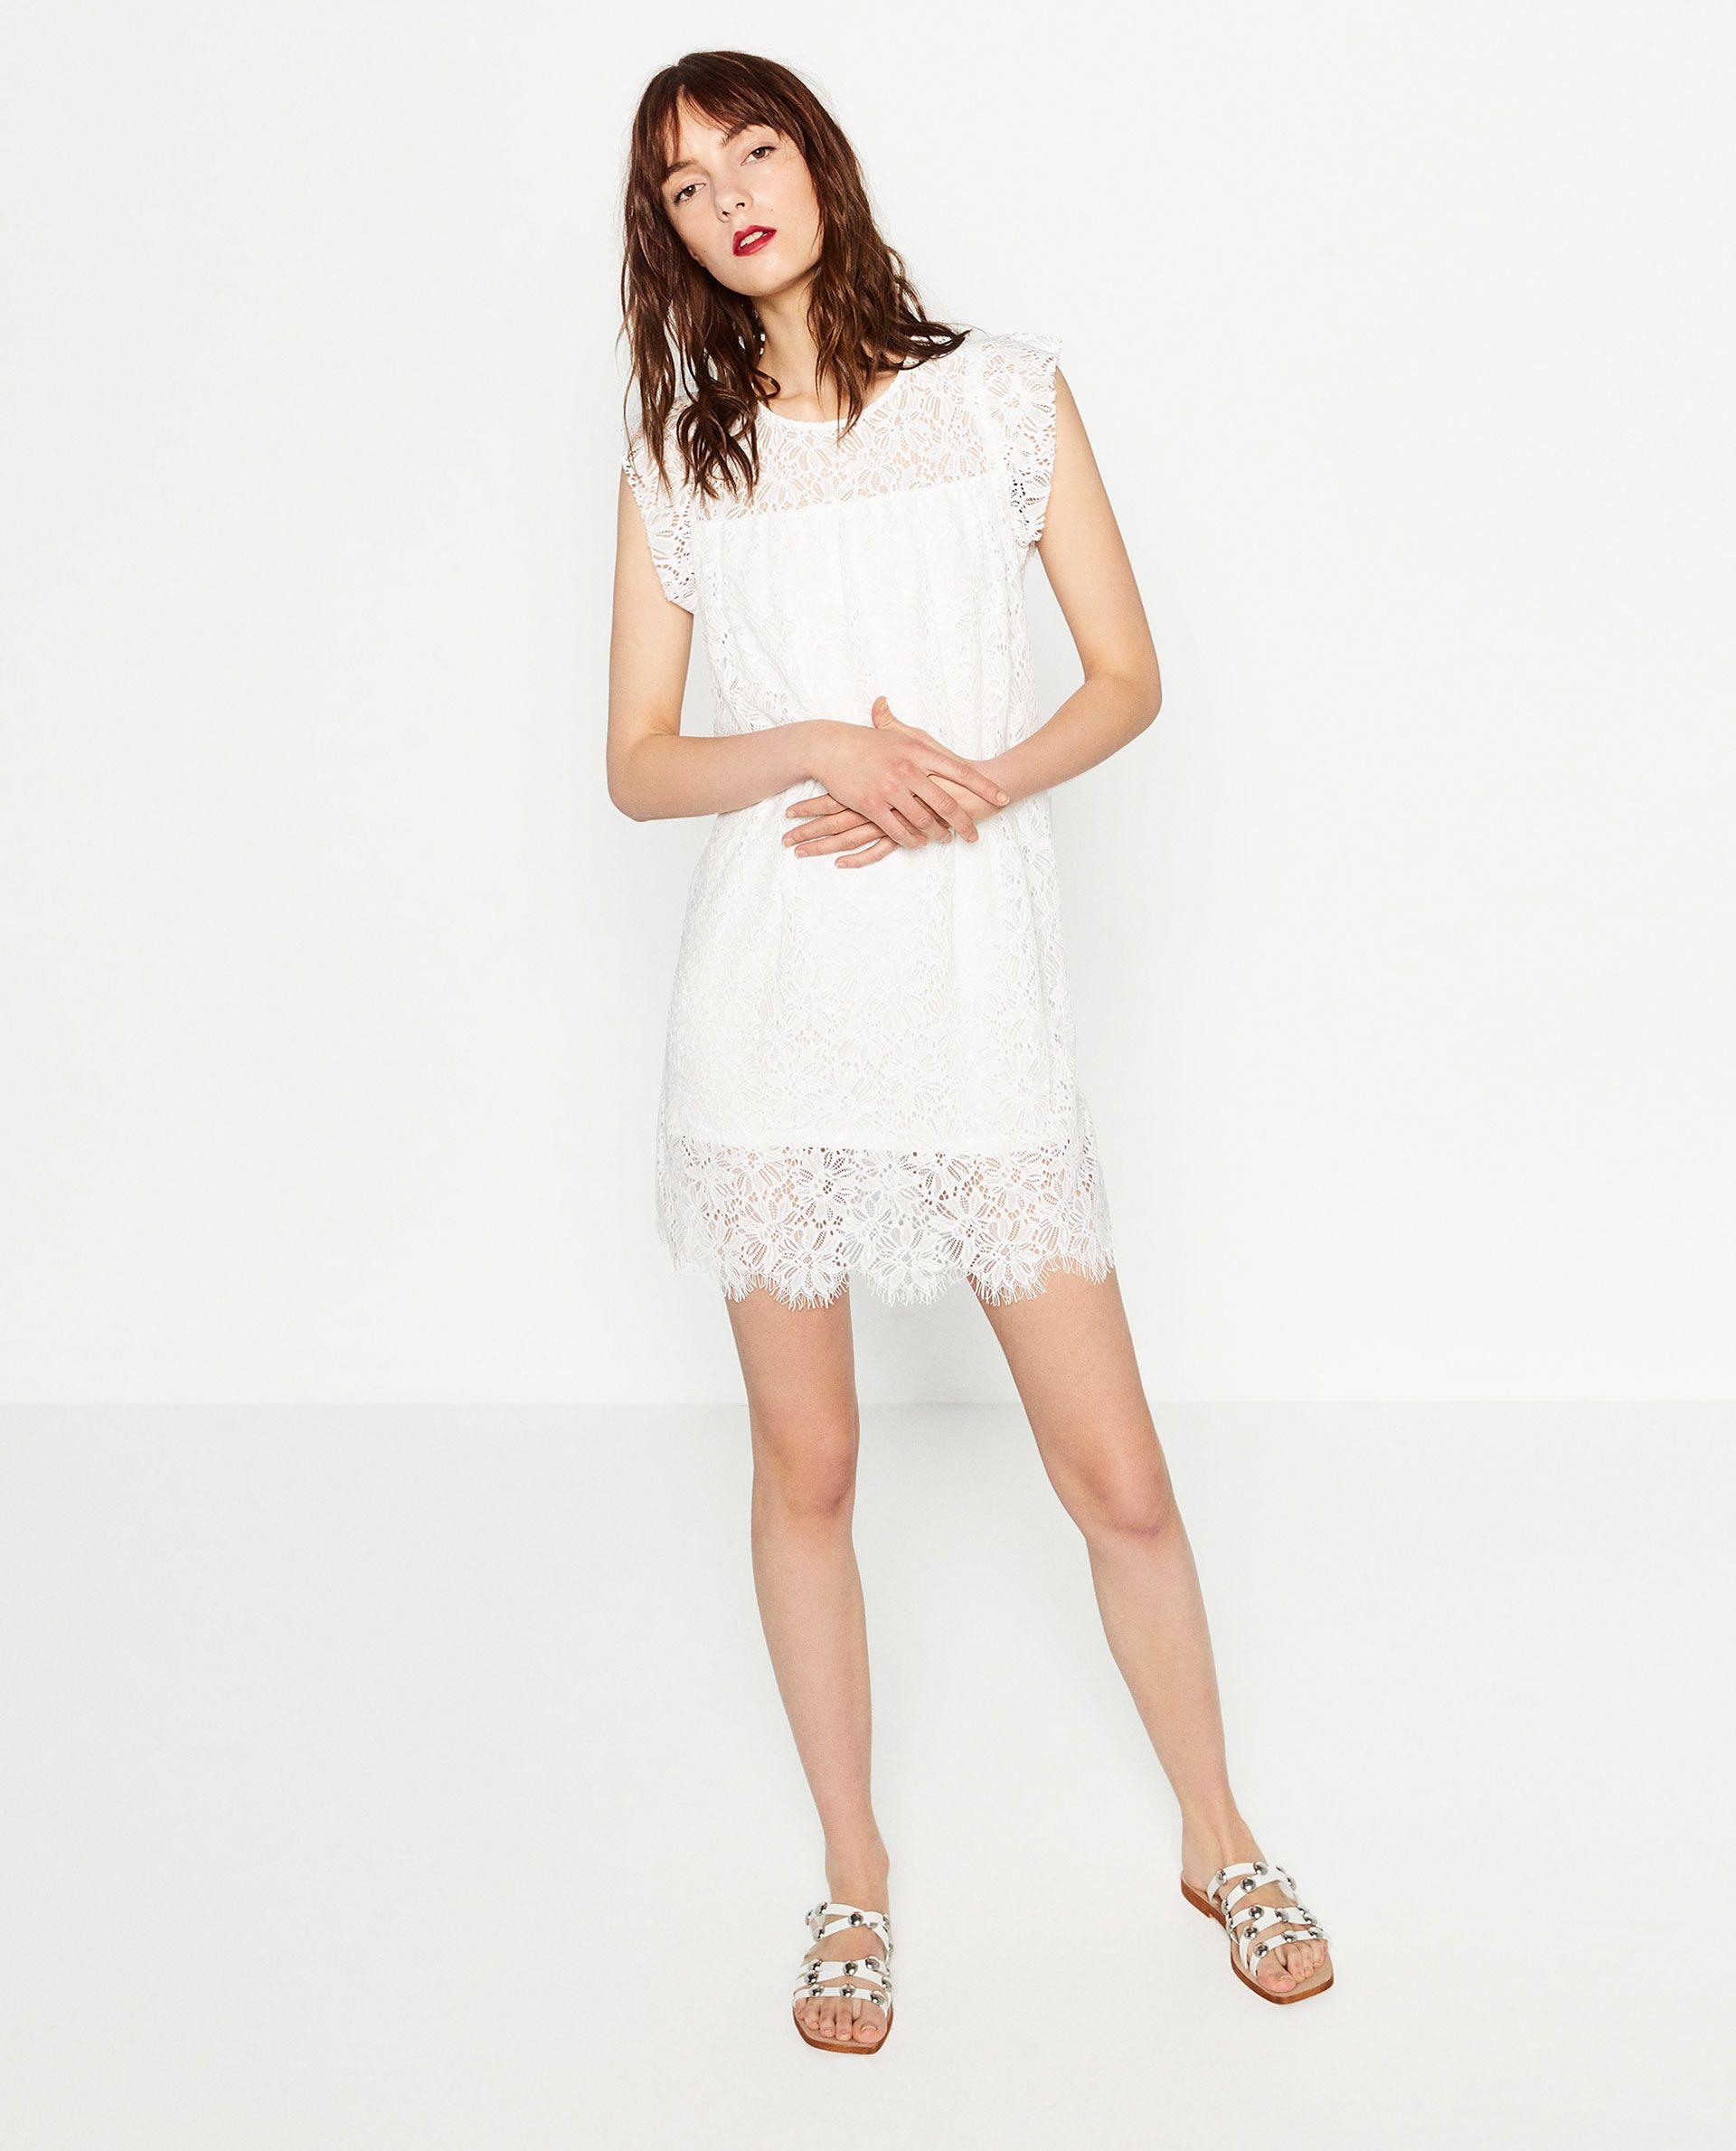 White lace dress zara  Pin by DeYs RoQue on IZARA  Pinterest